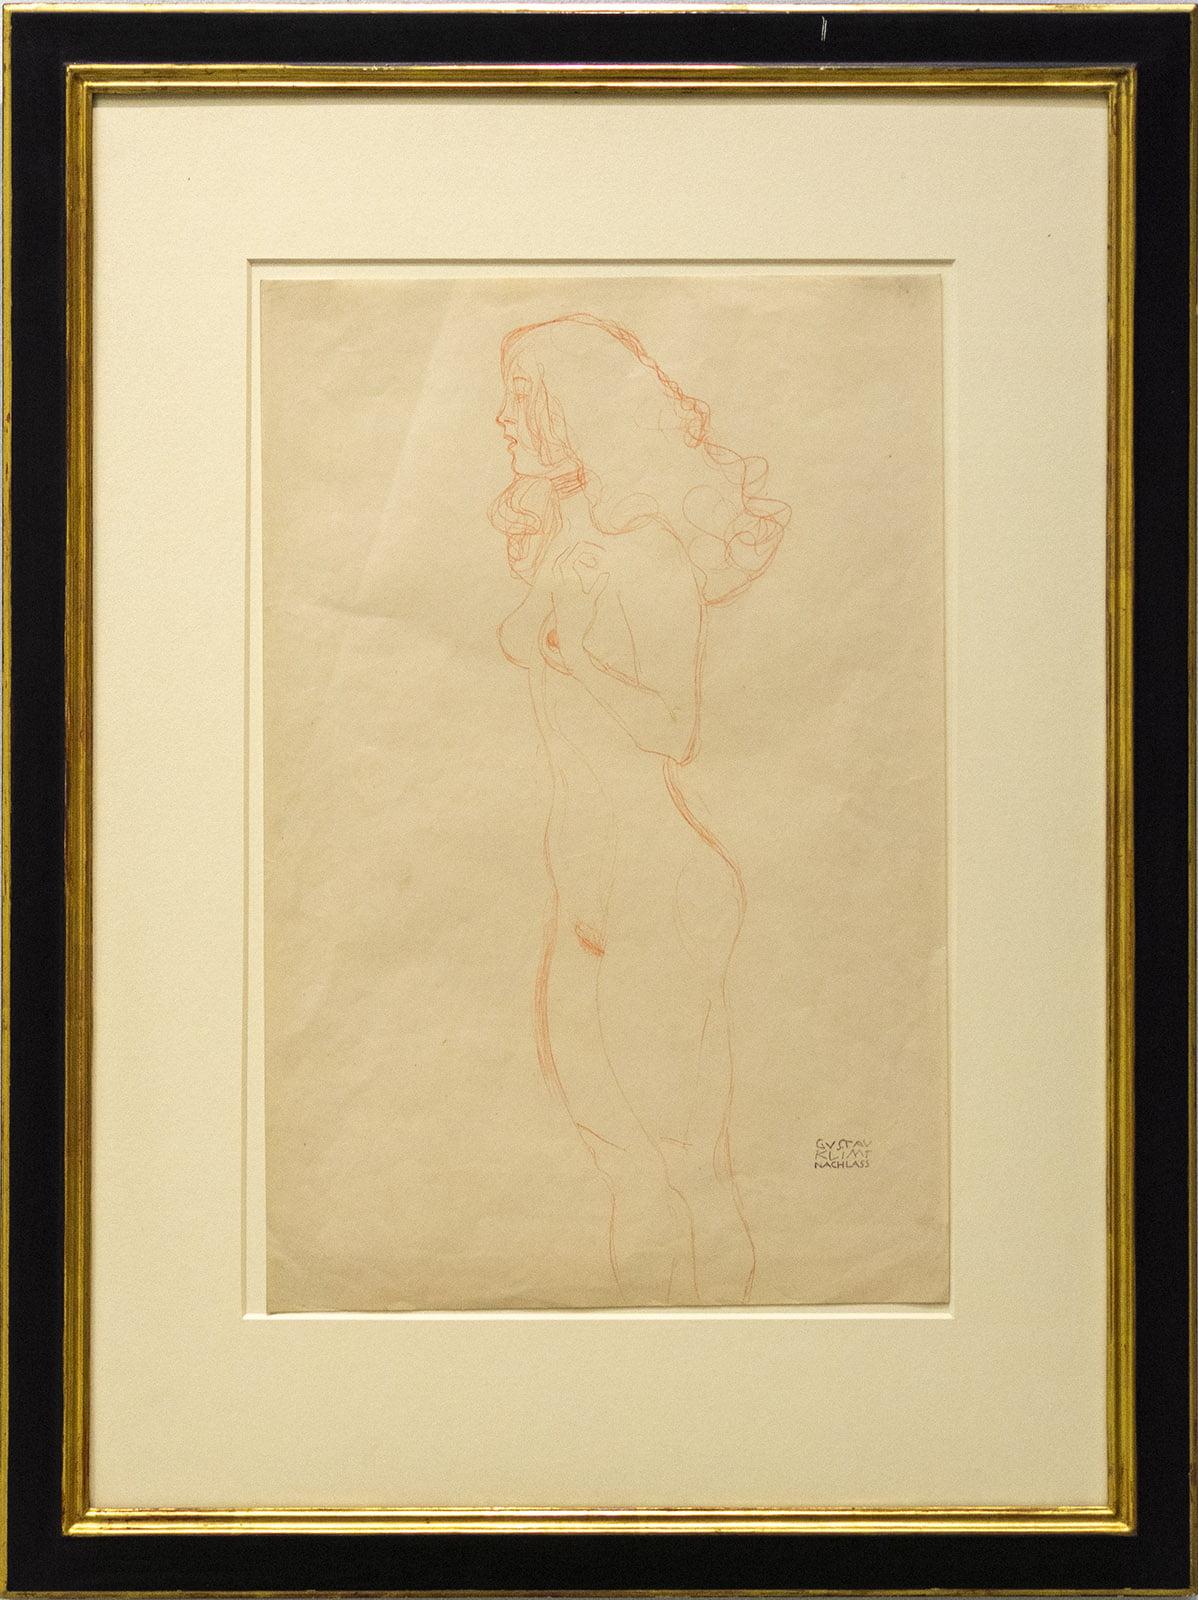 Kunstmuseum, Den Haag, Judith, Edith, Klimt